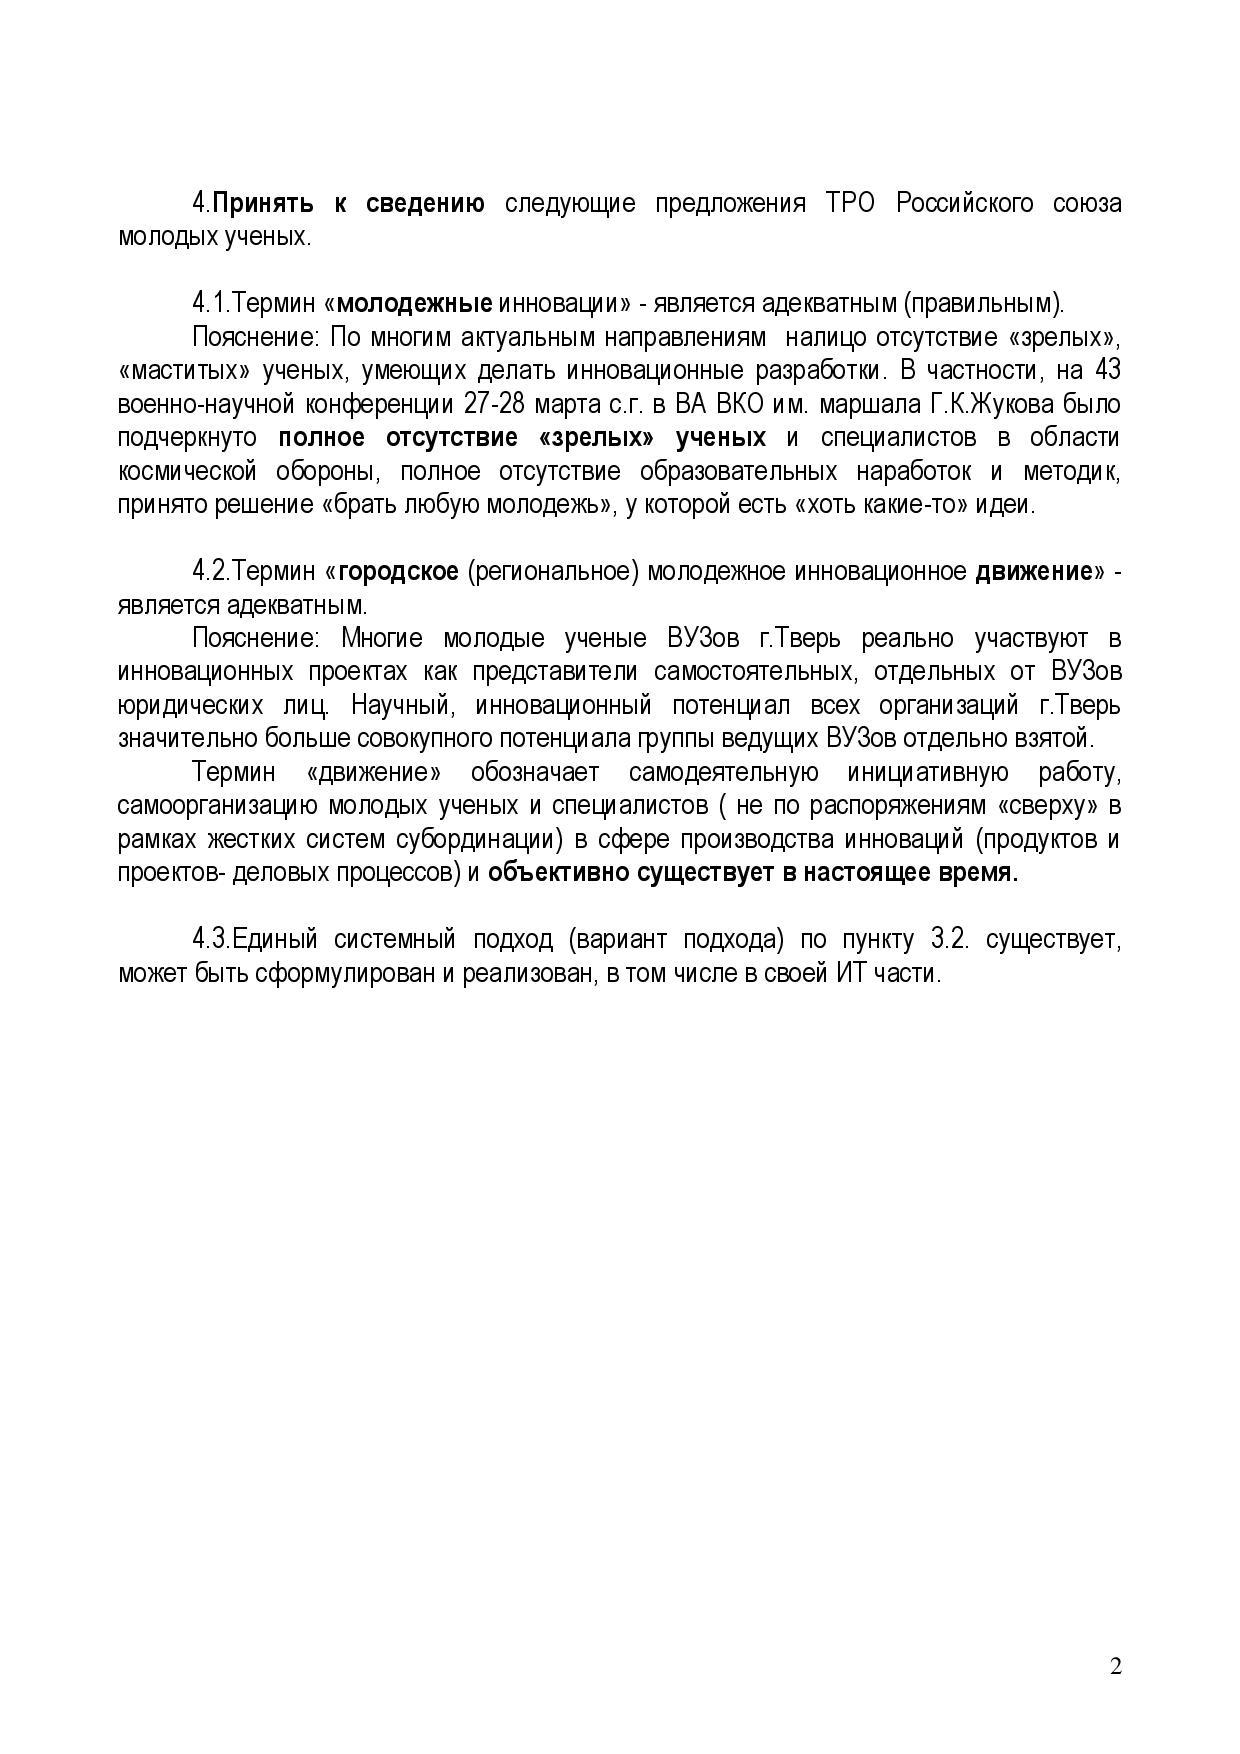 Проект решений-1-page-002